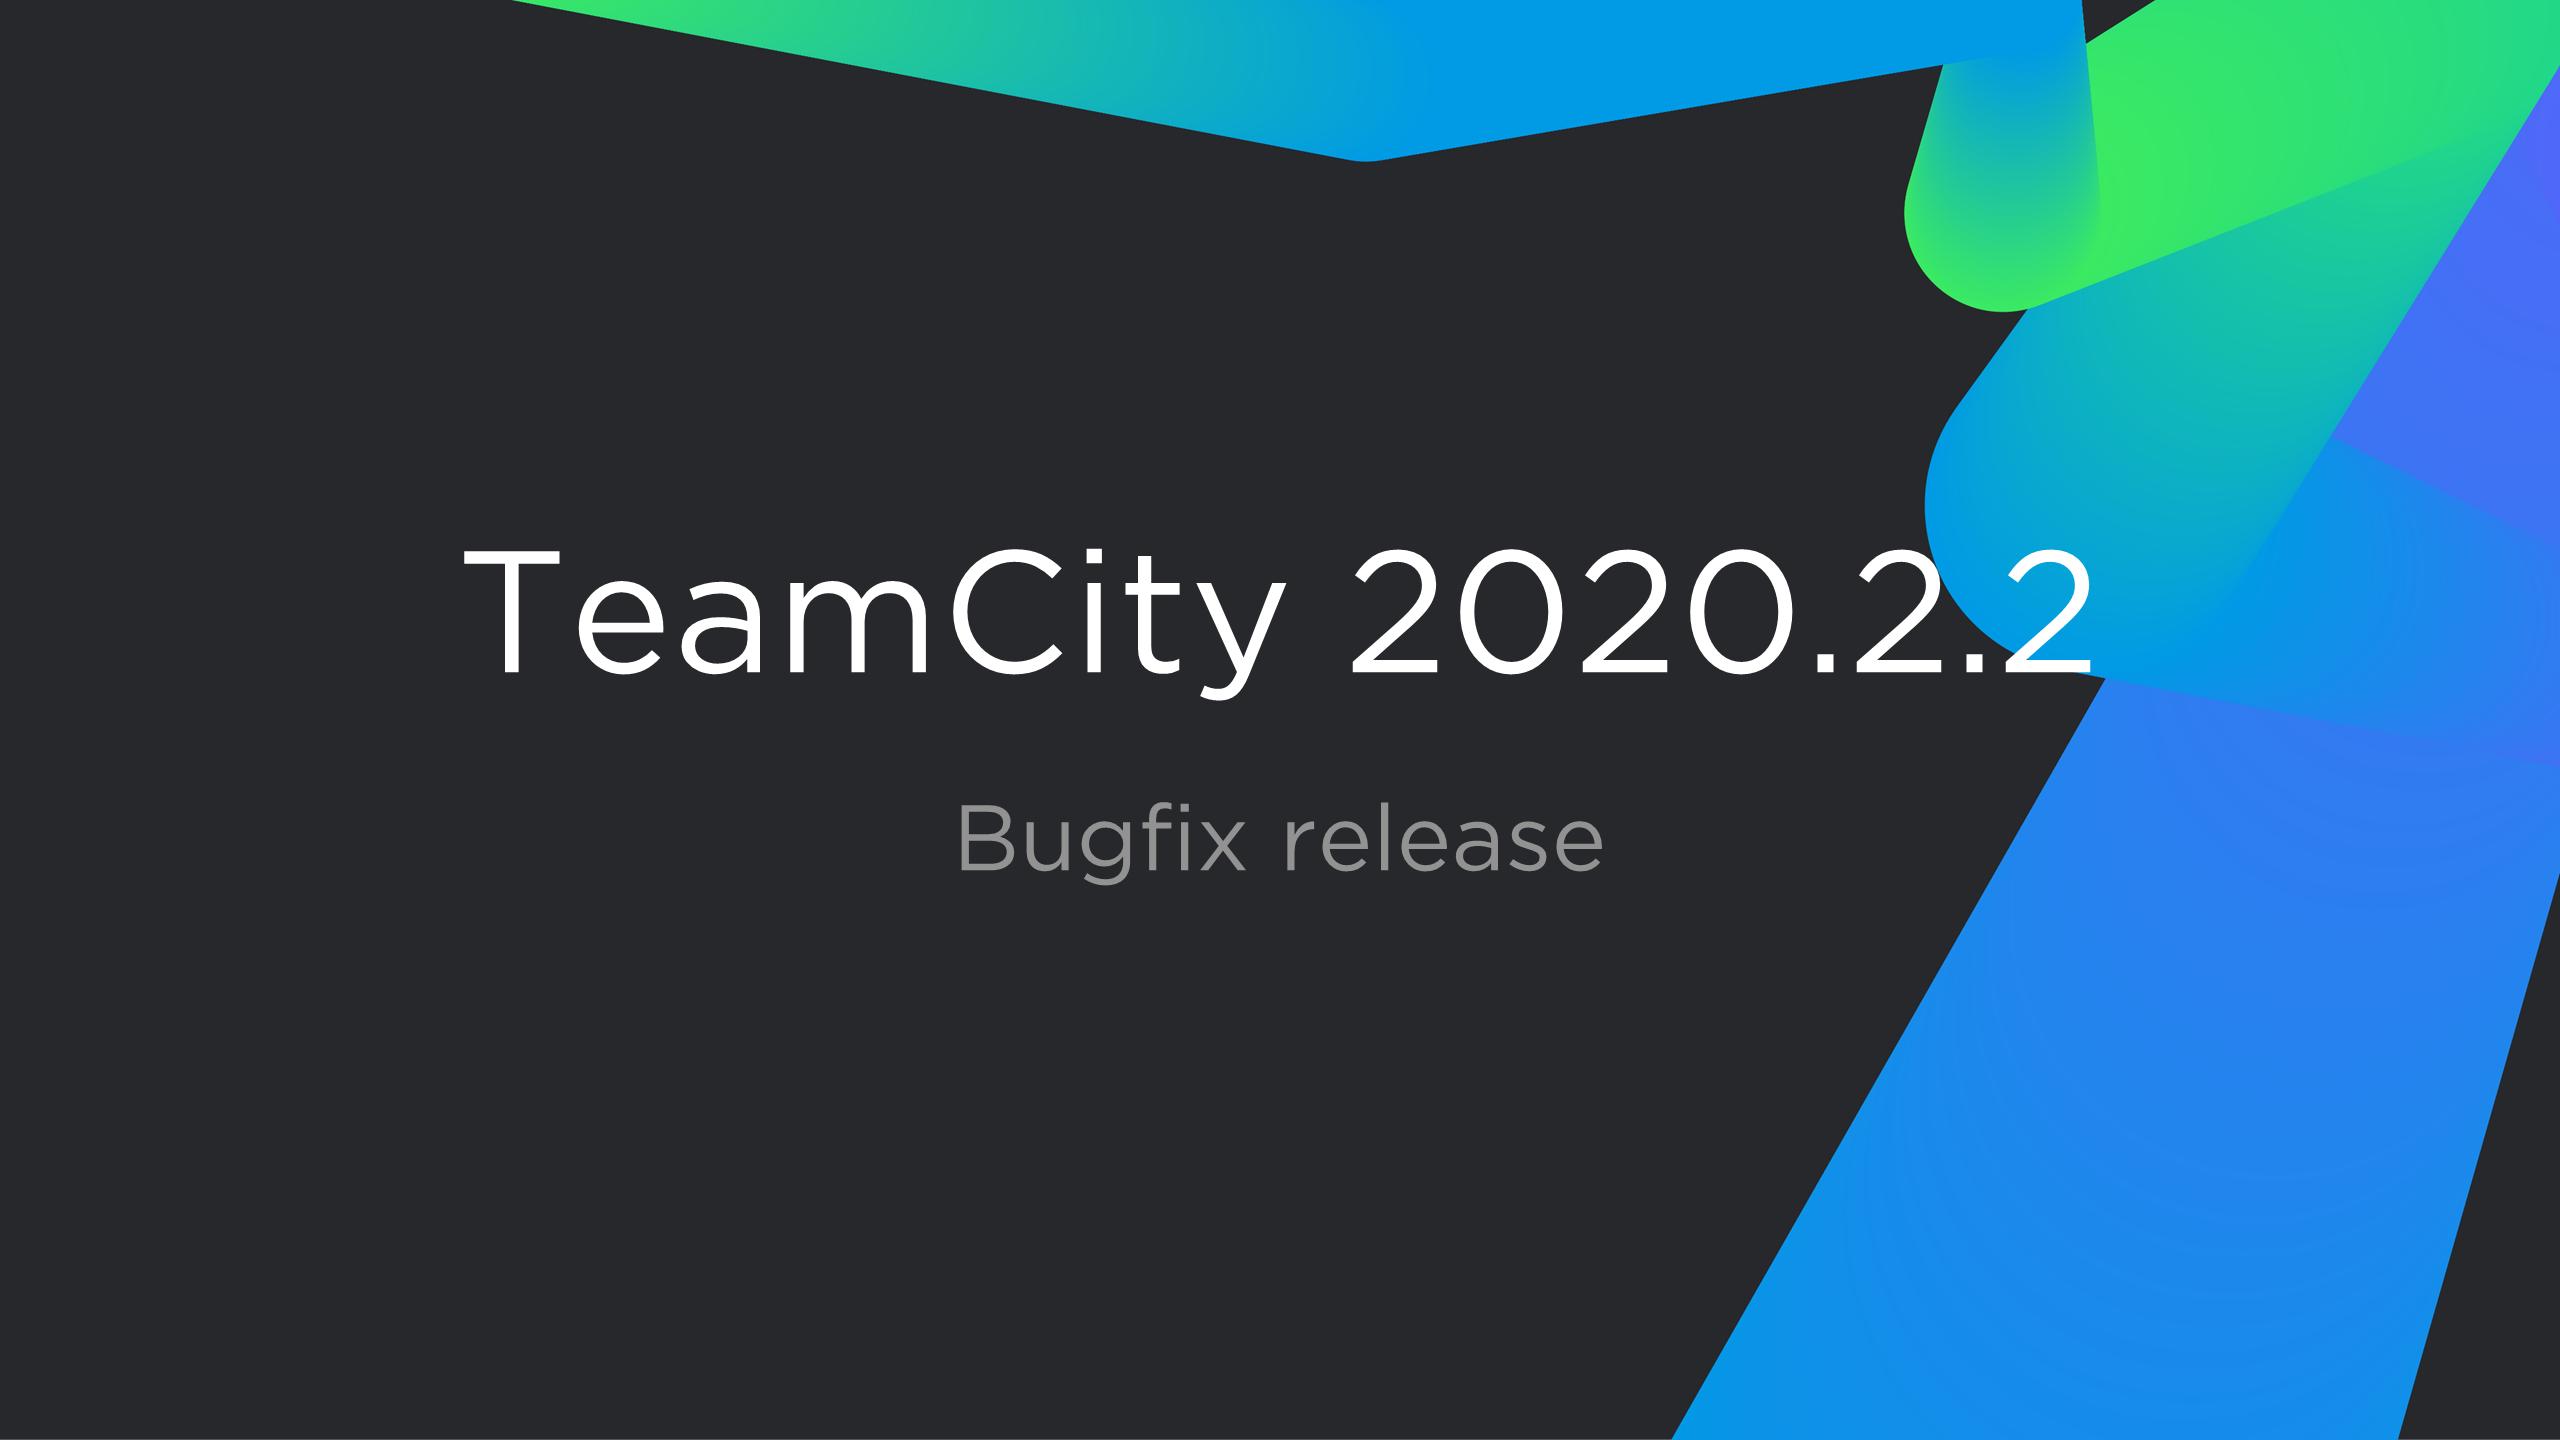 2020.2.2